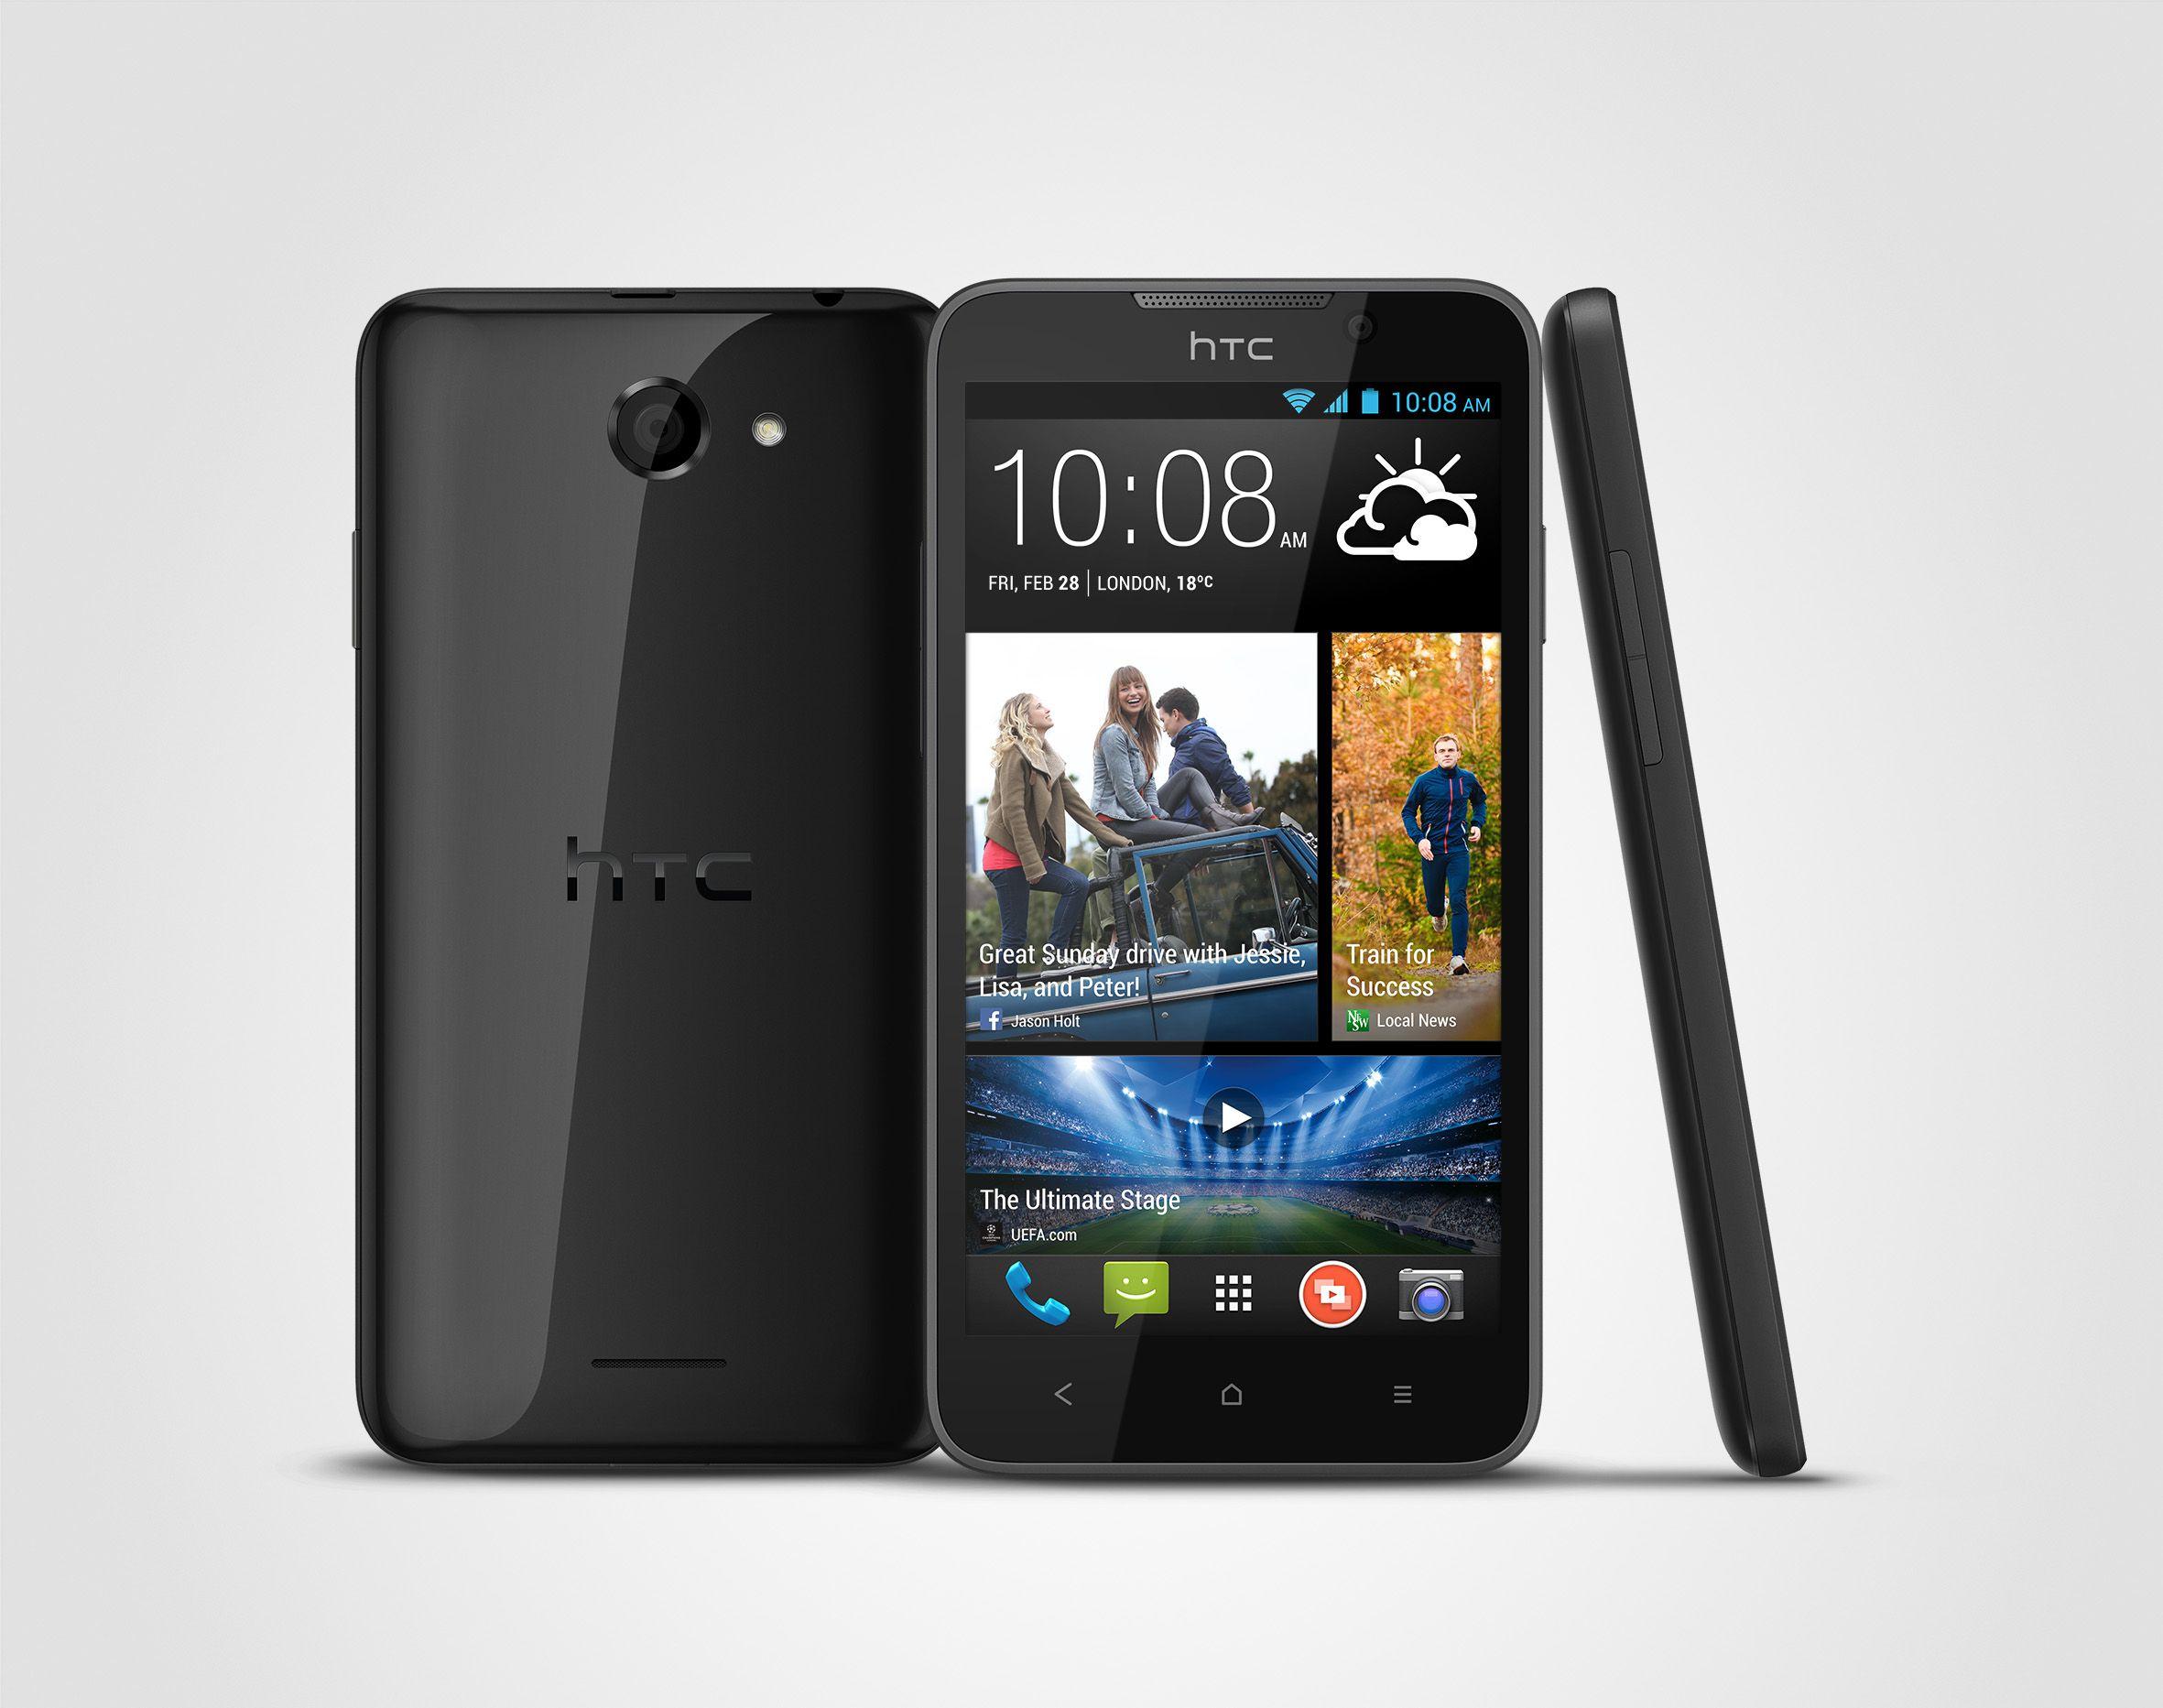 htc desire 516 smartphone android kitkat 5 pouces sous les 200 euros. Black Bedroom Furniture Sets. Home Design Ideas